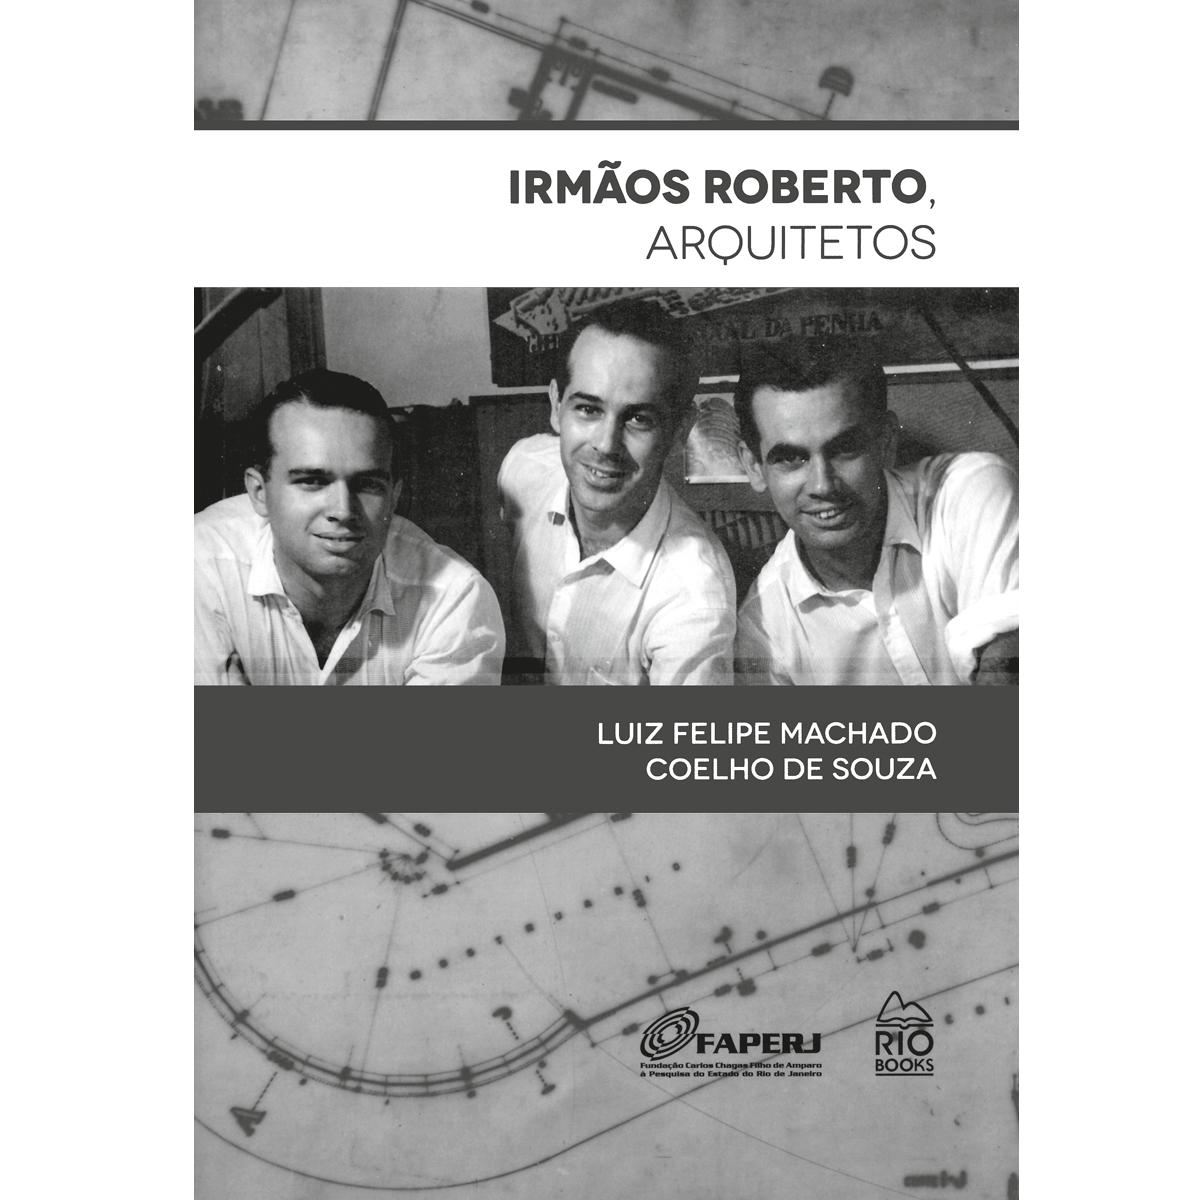 Irmãos Roberto, arquitetos